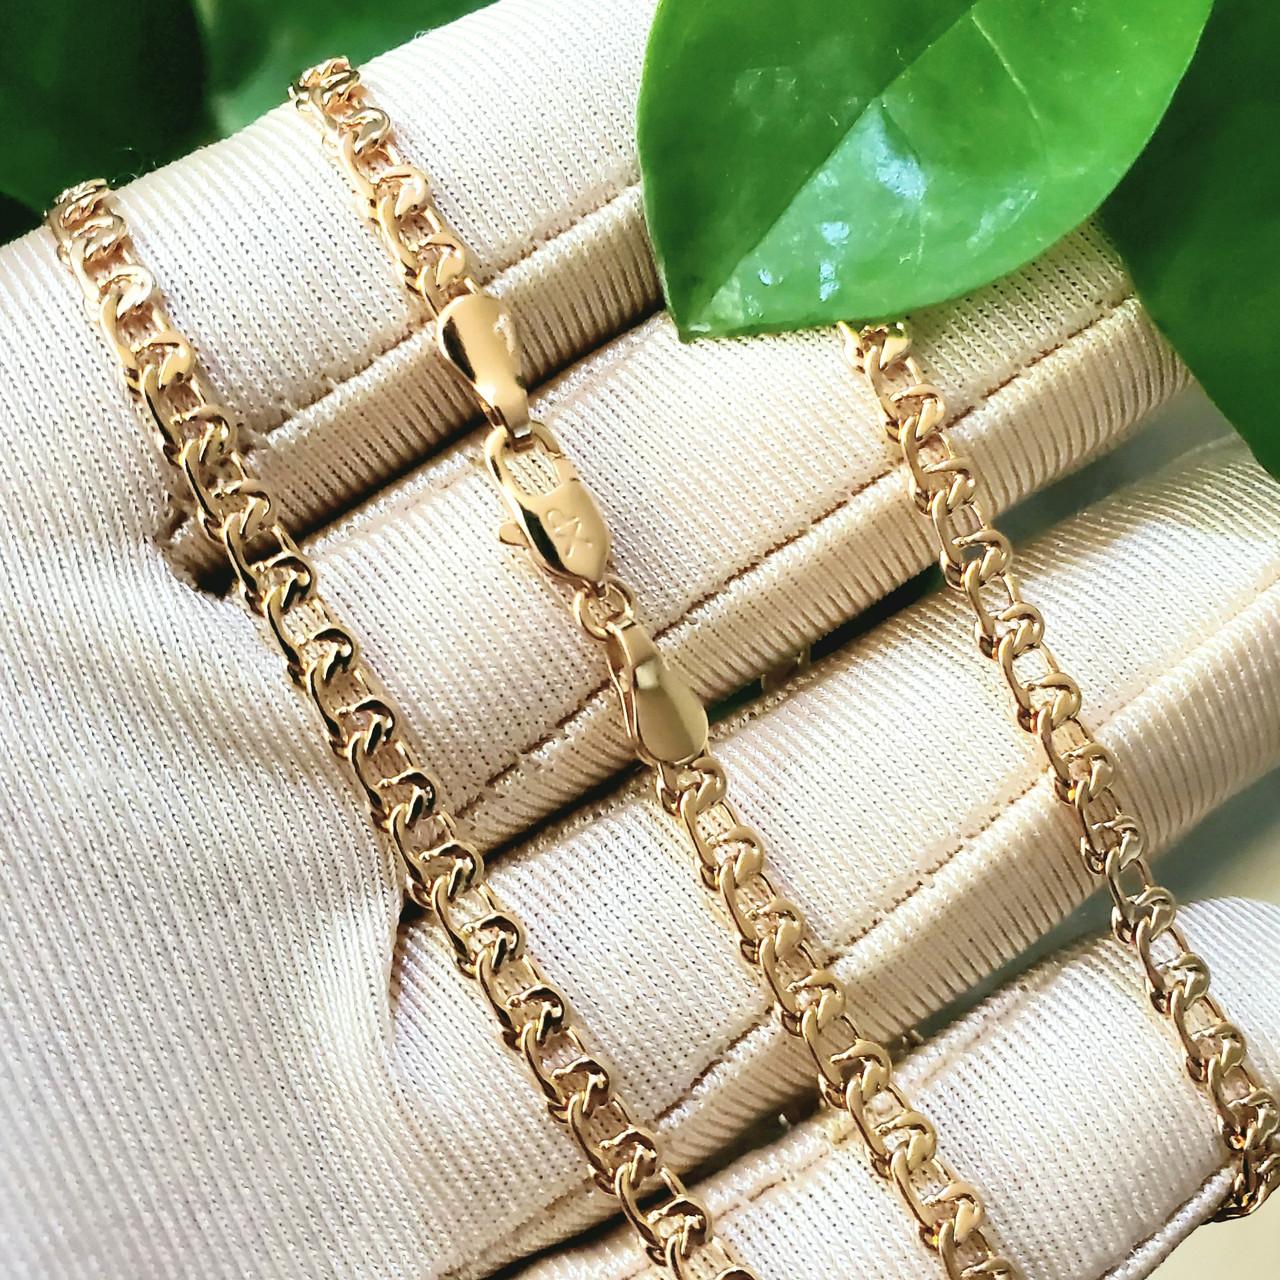 Ланцюжок Xuping 3мм 55см медзолото позолота 18К плетіння Муза ц583